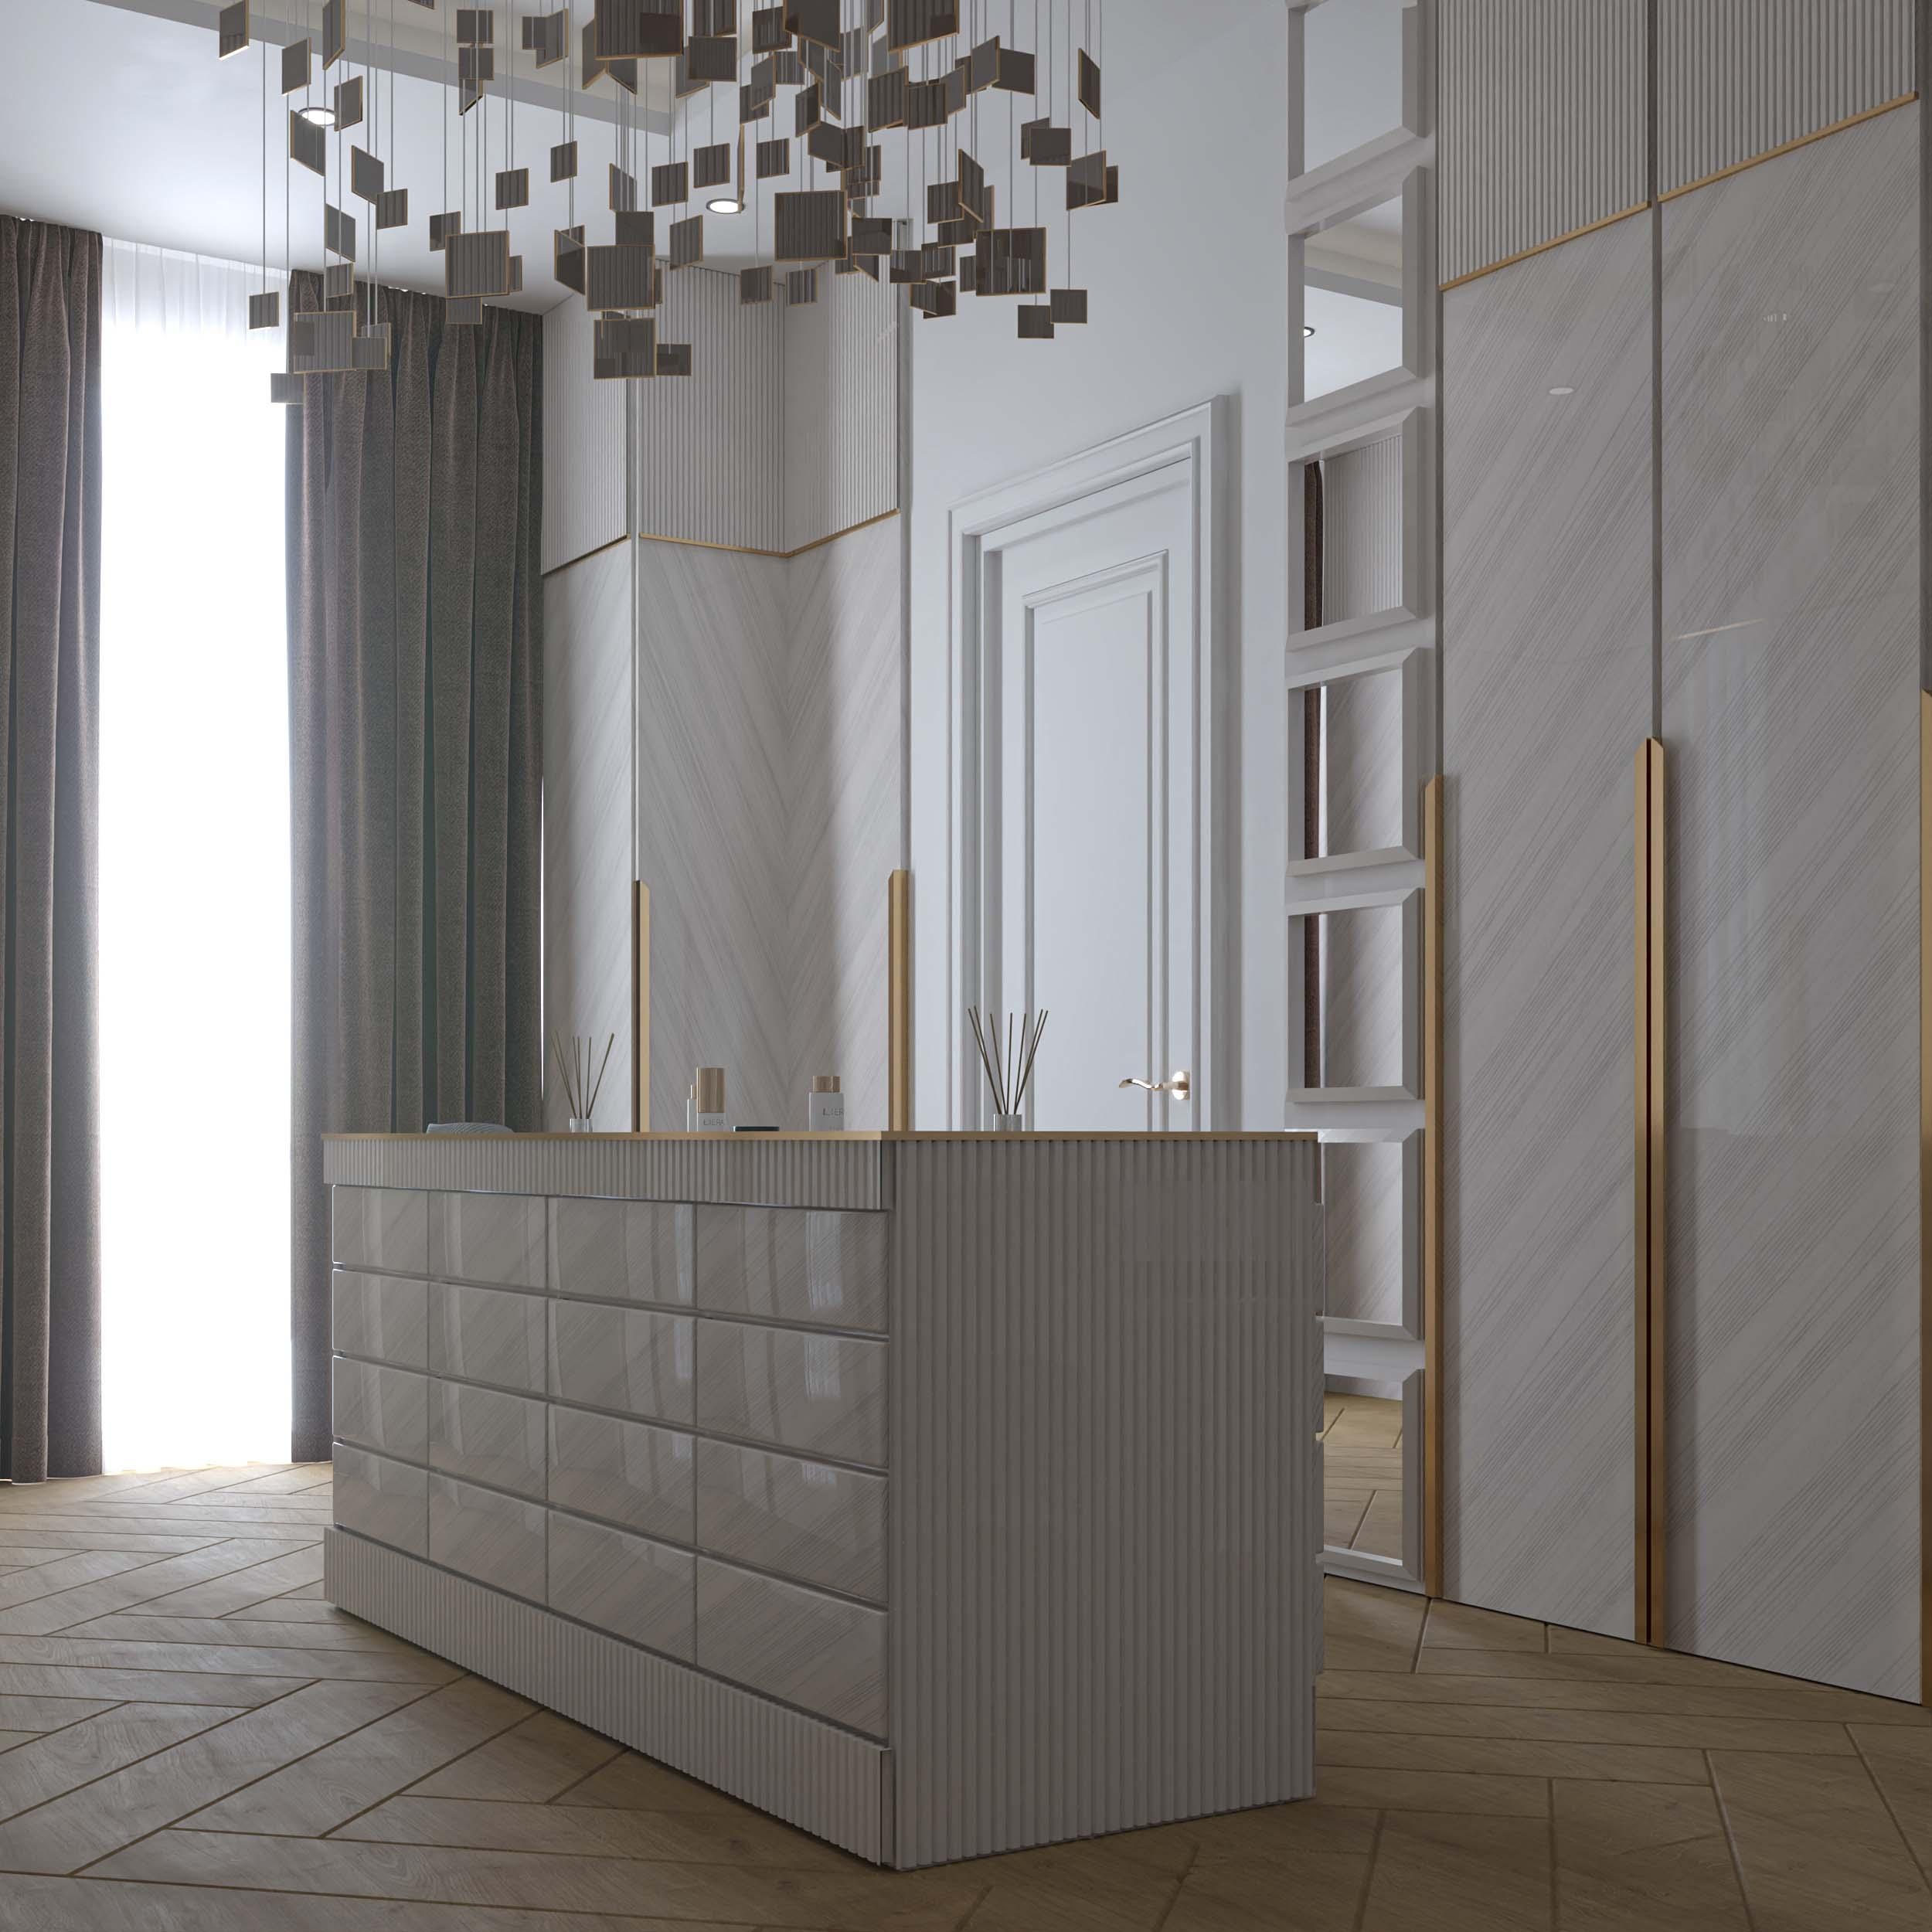 dressing rooms designs - white color - golden touch - men dressing room